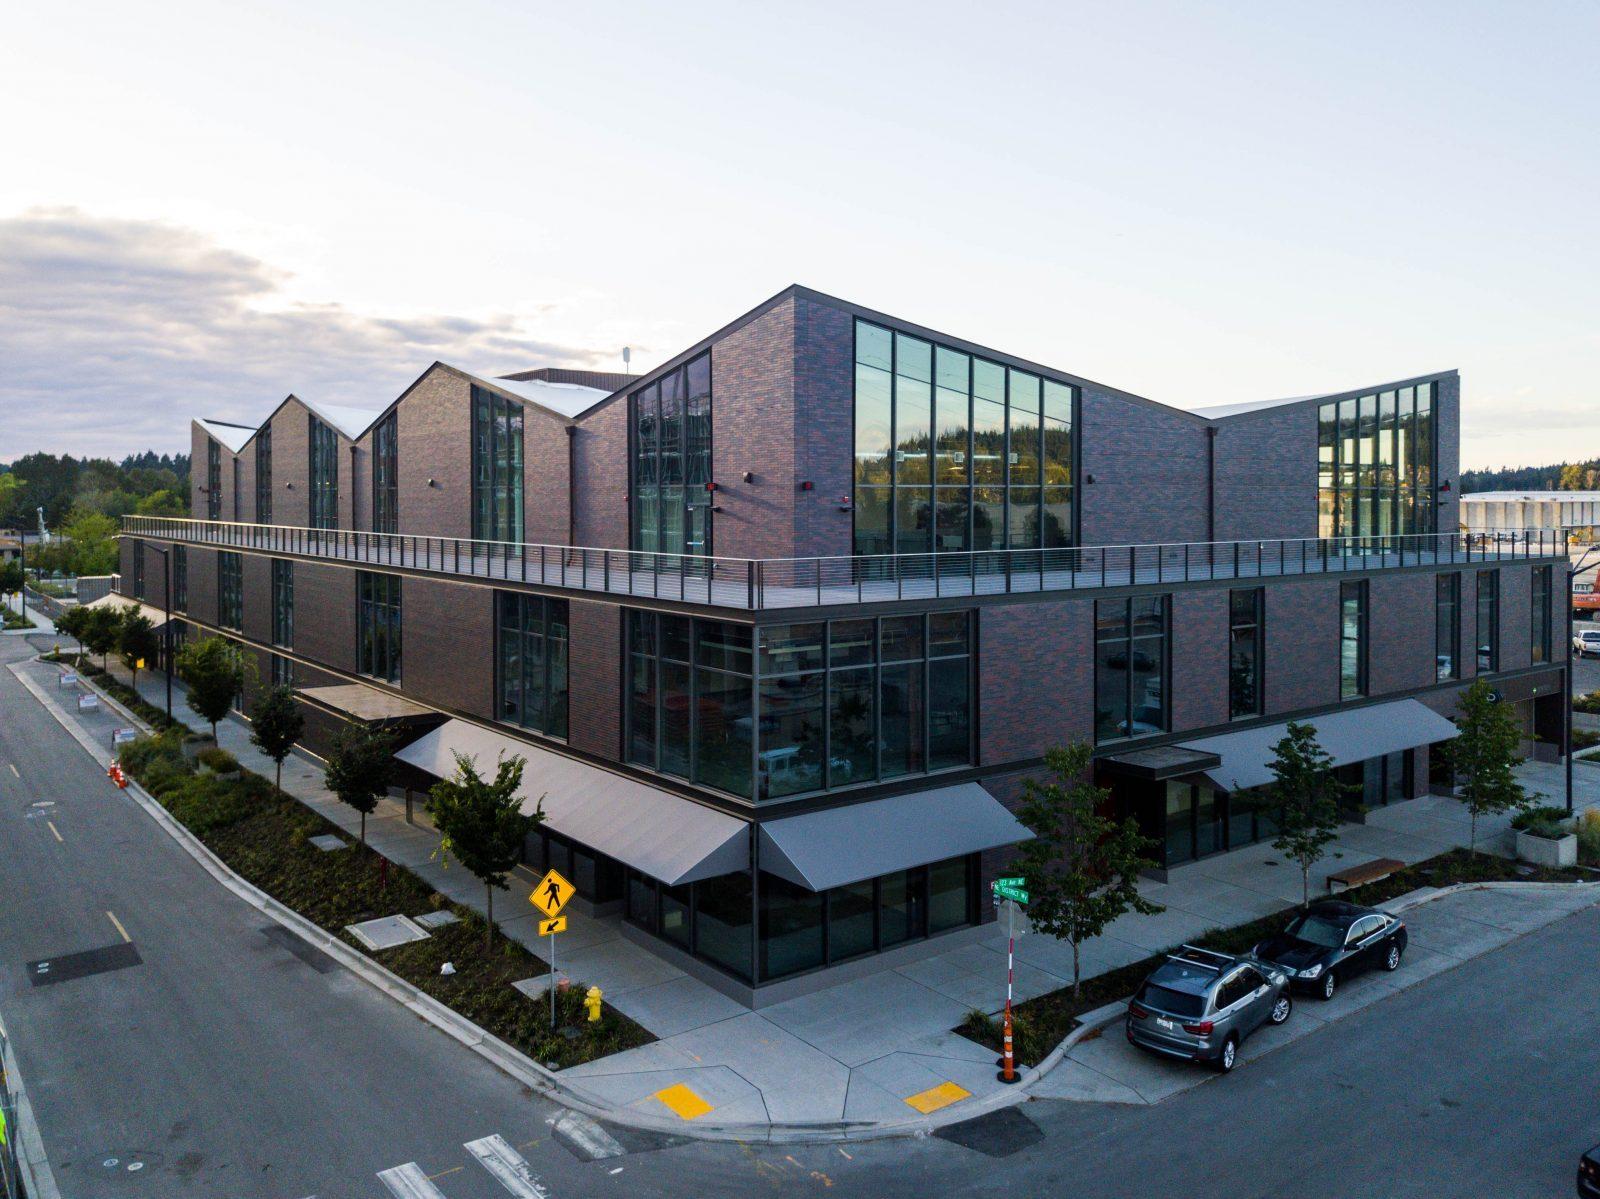 JMJ_TEAM_Sumner WA - Civil Engineering - Planning - Project Facilitation